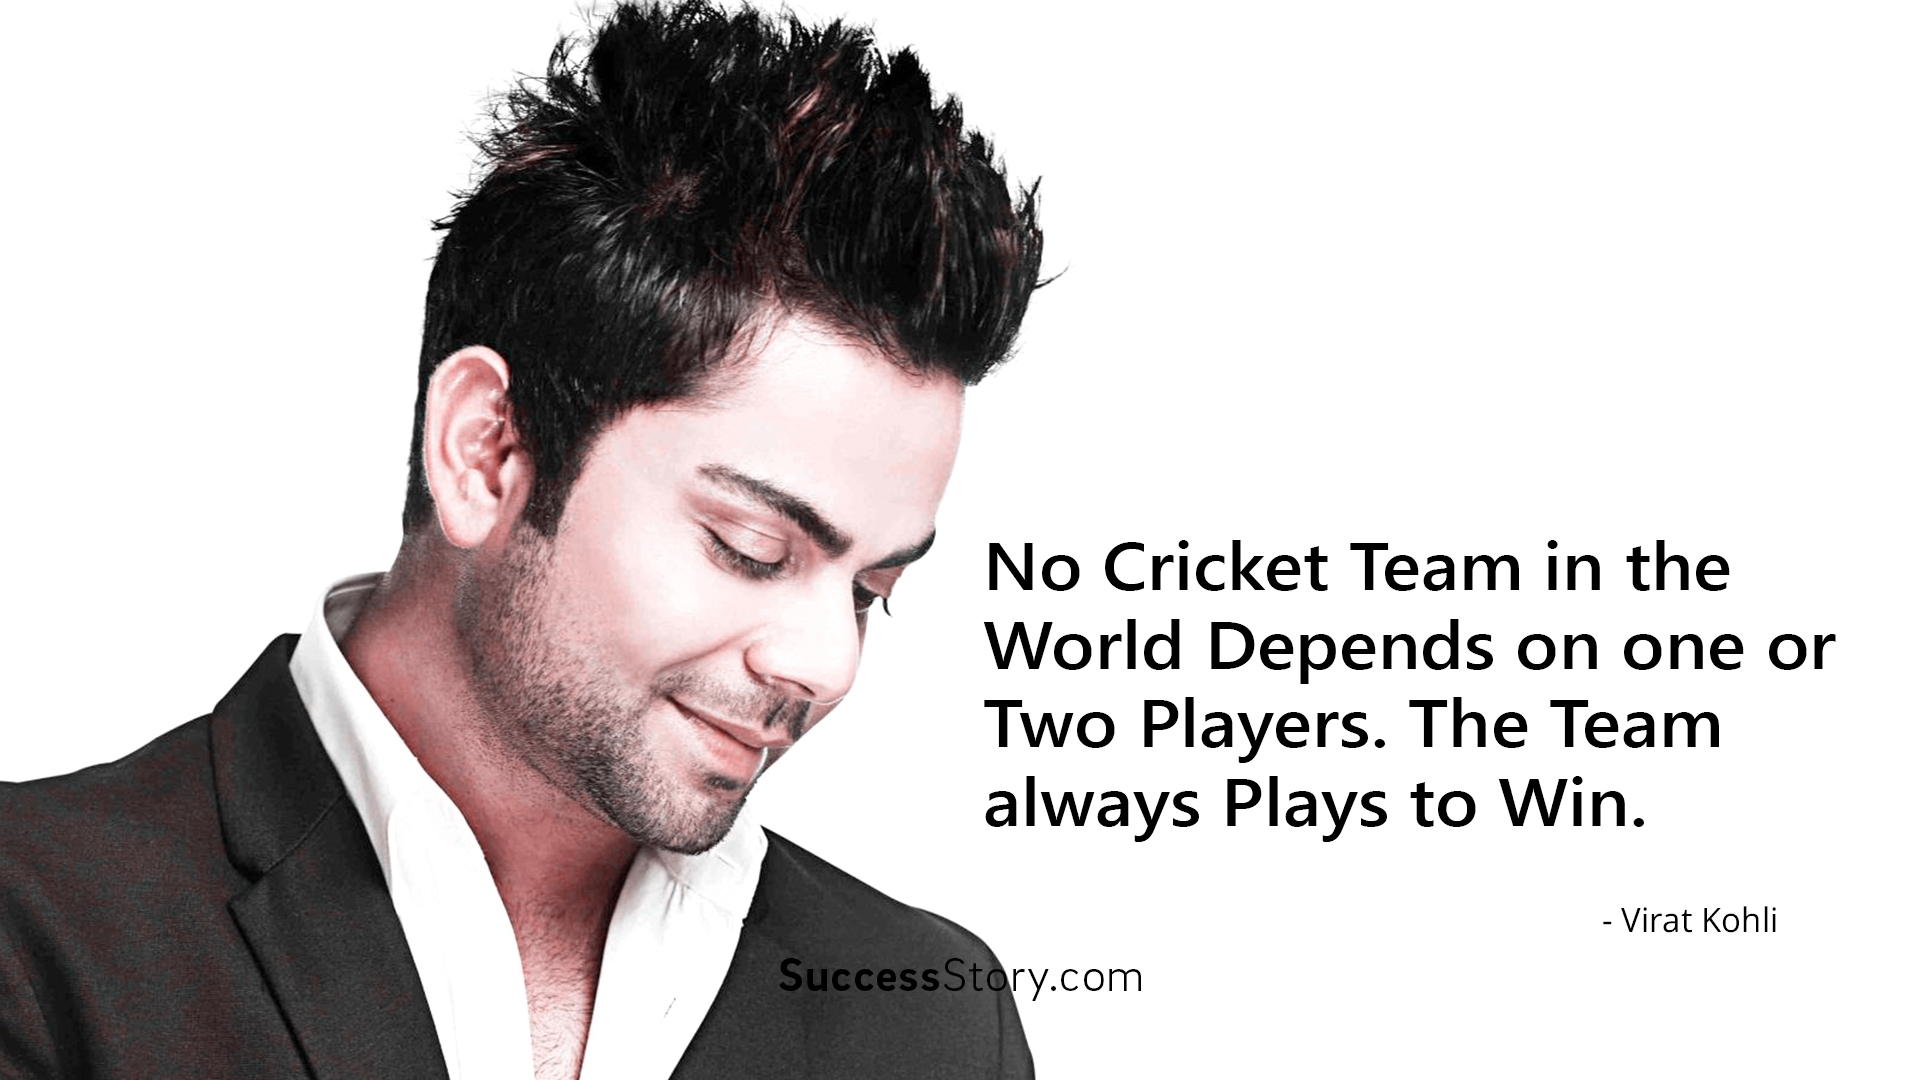 No cricket team in the